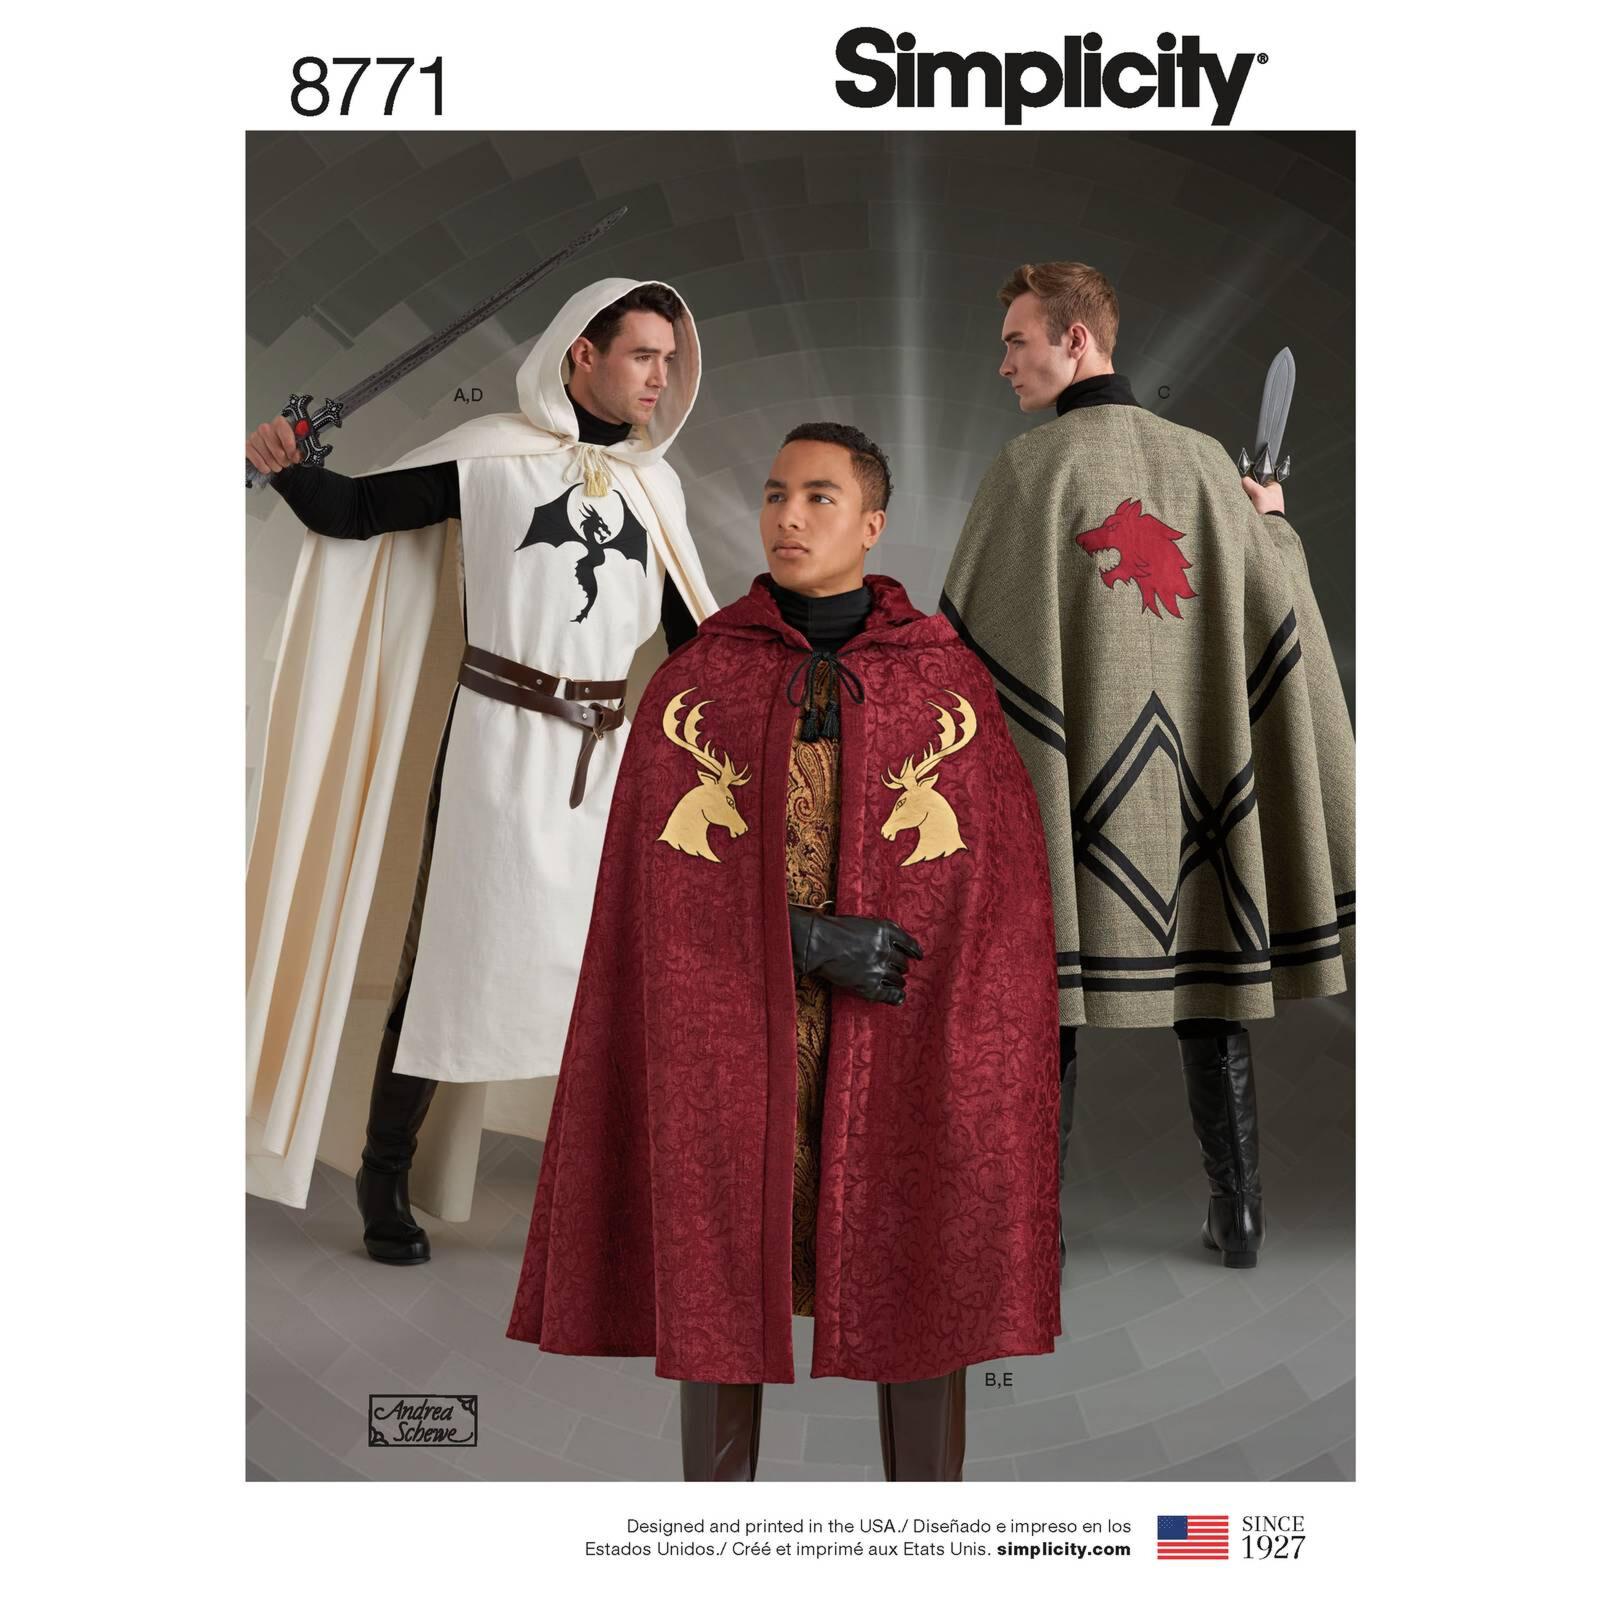 Simplicity 8771